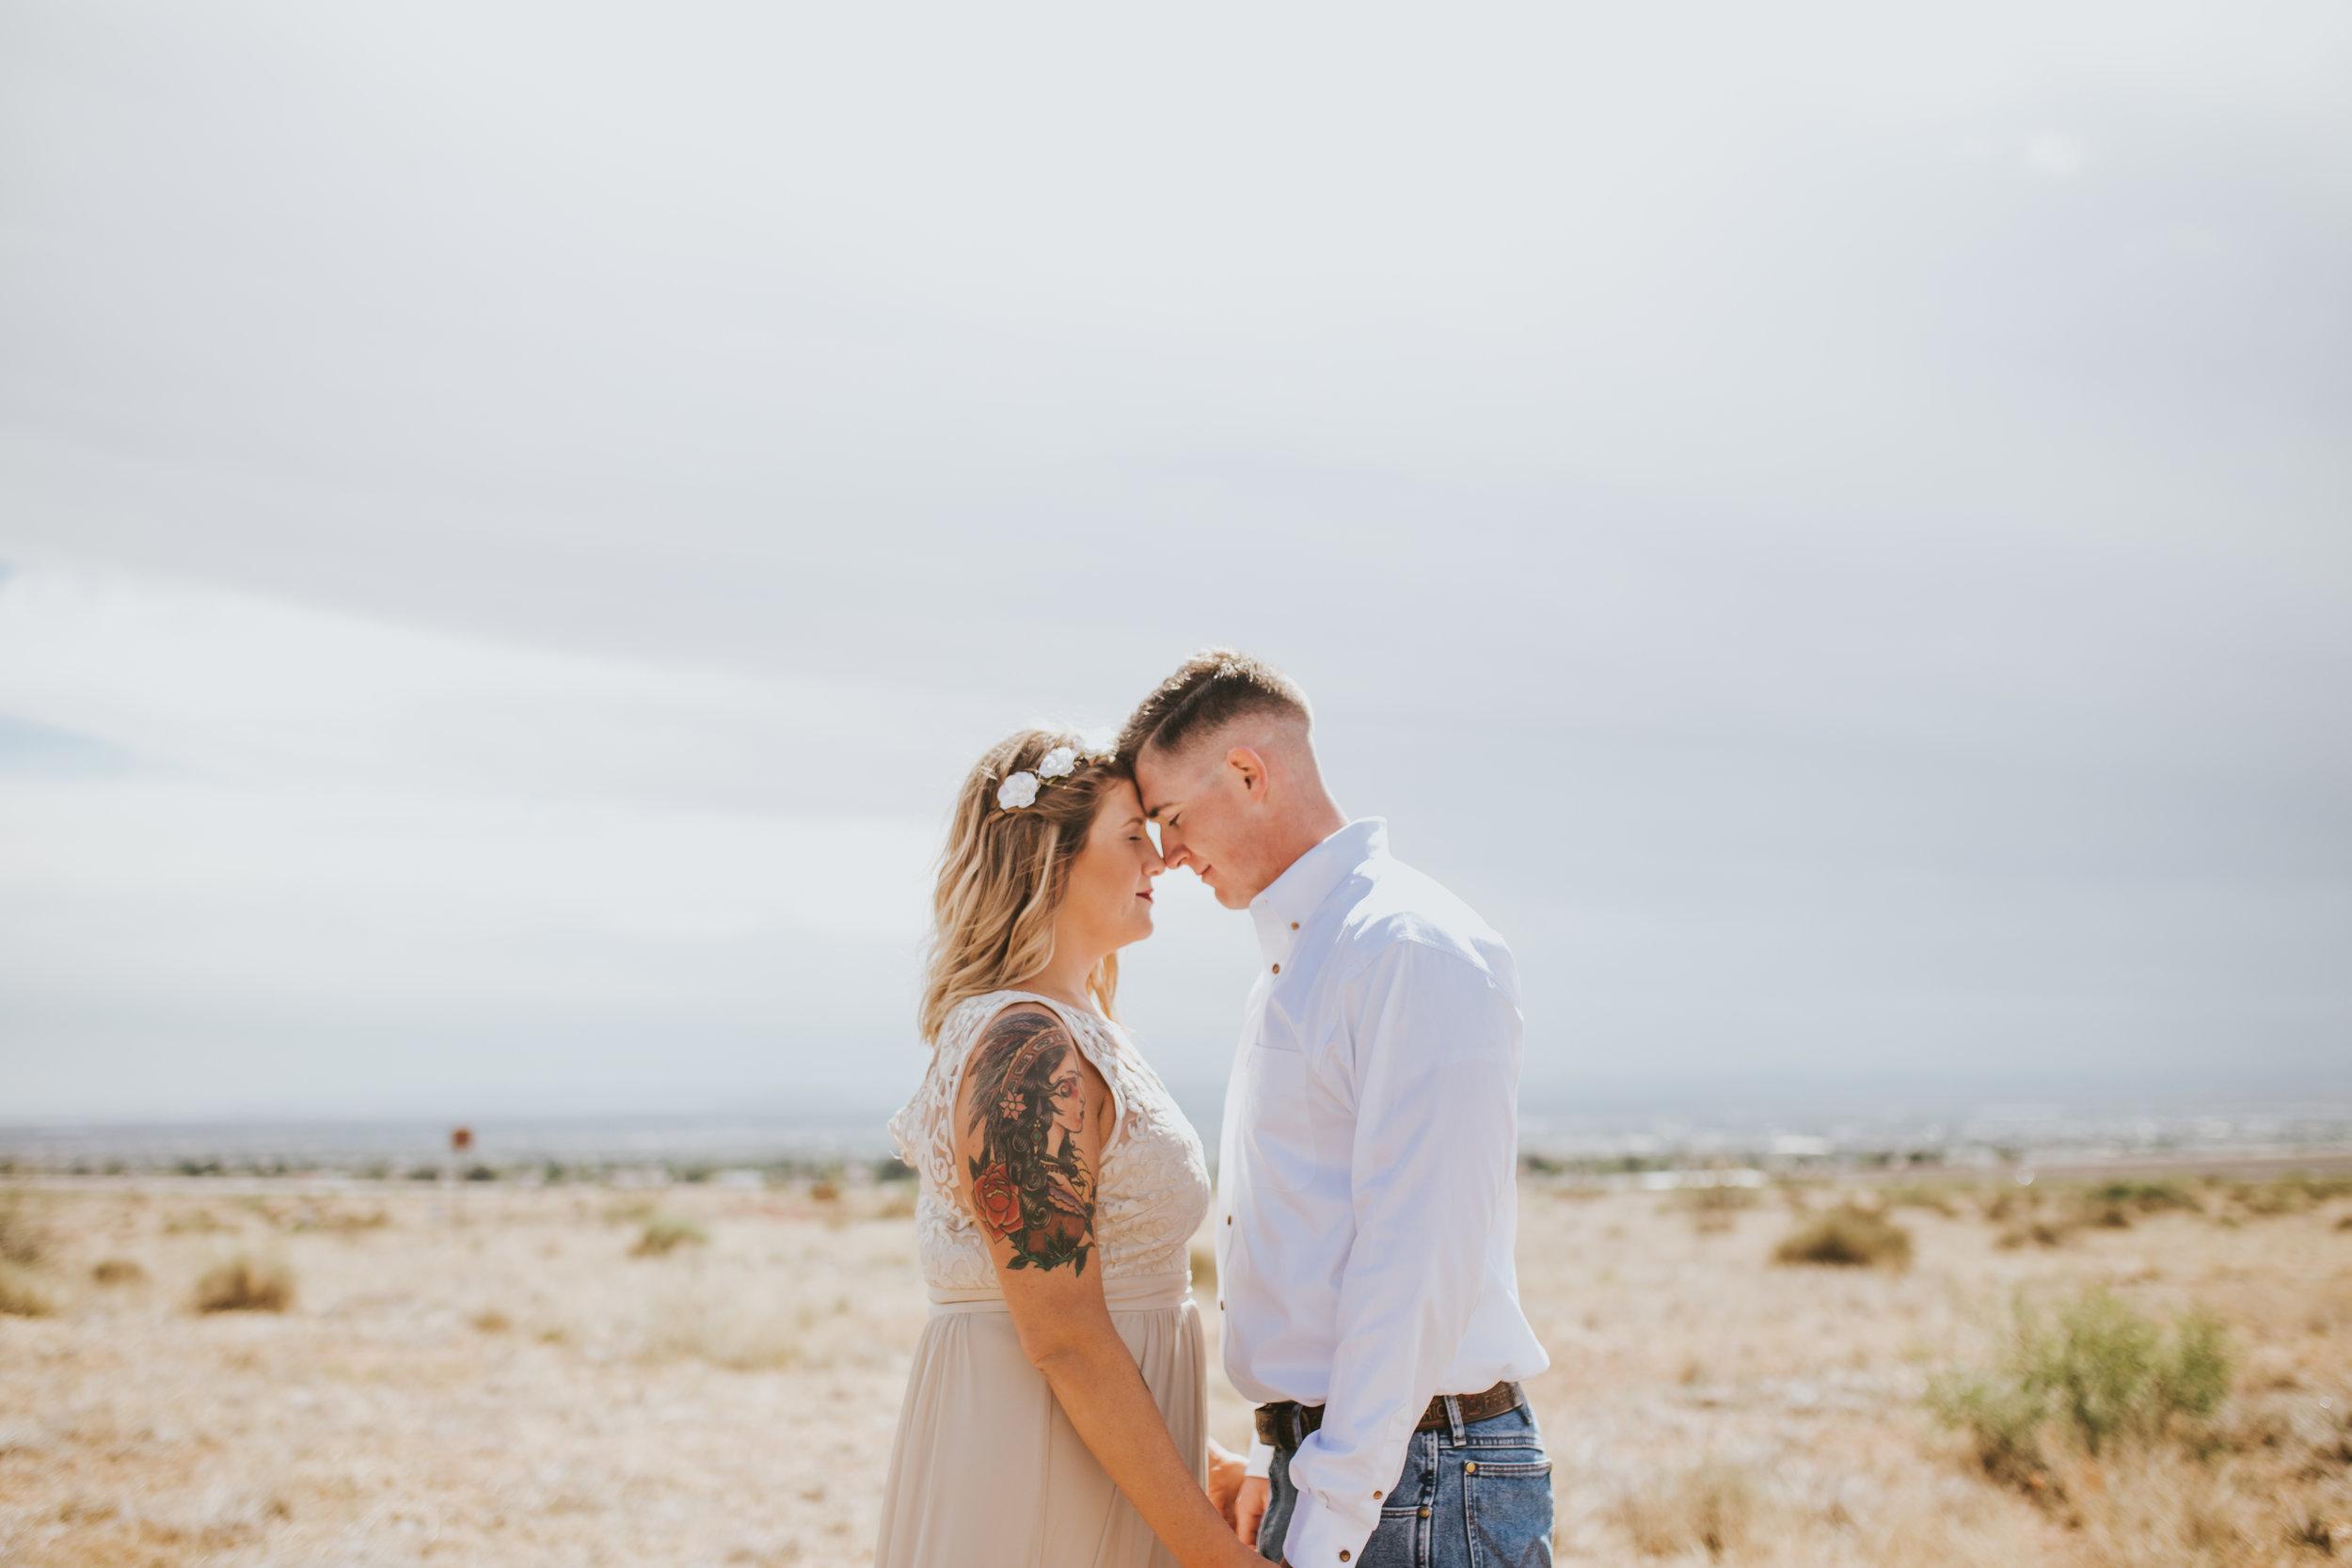 el-paso-texas-wedding-photographer-33